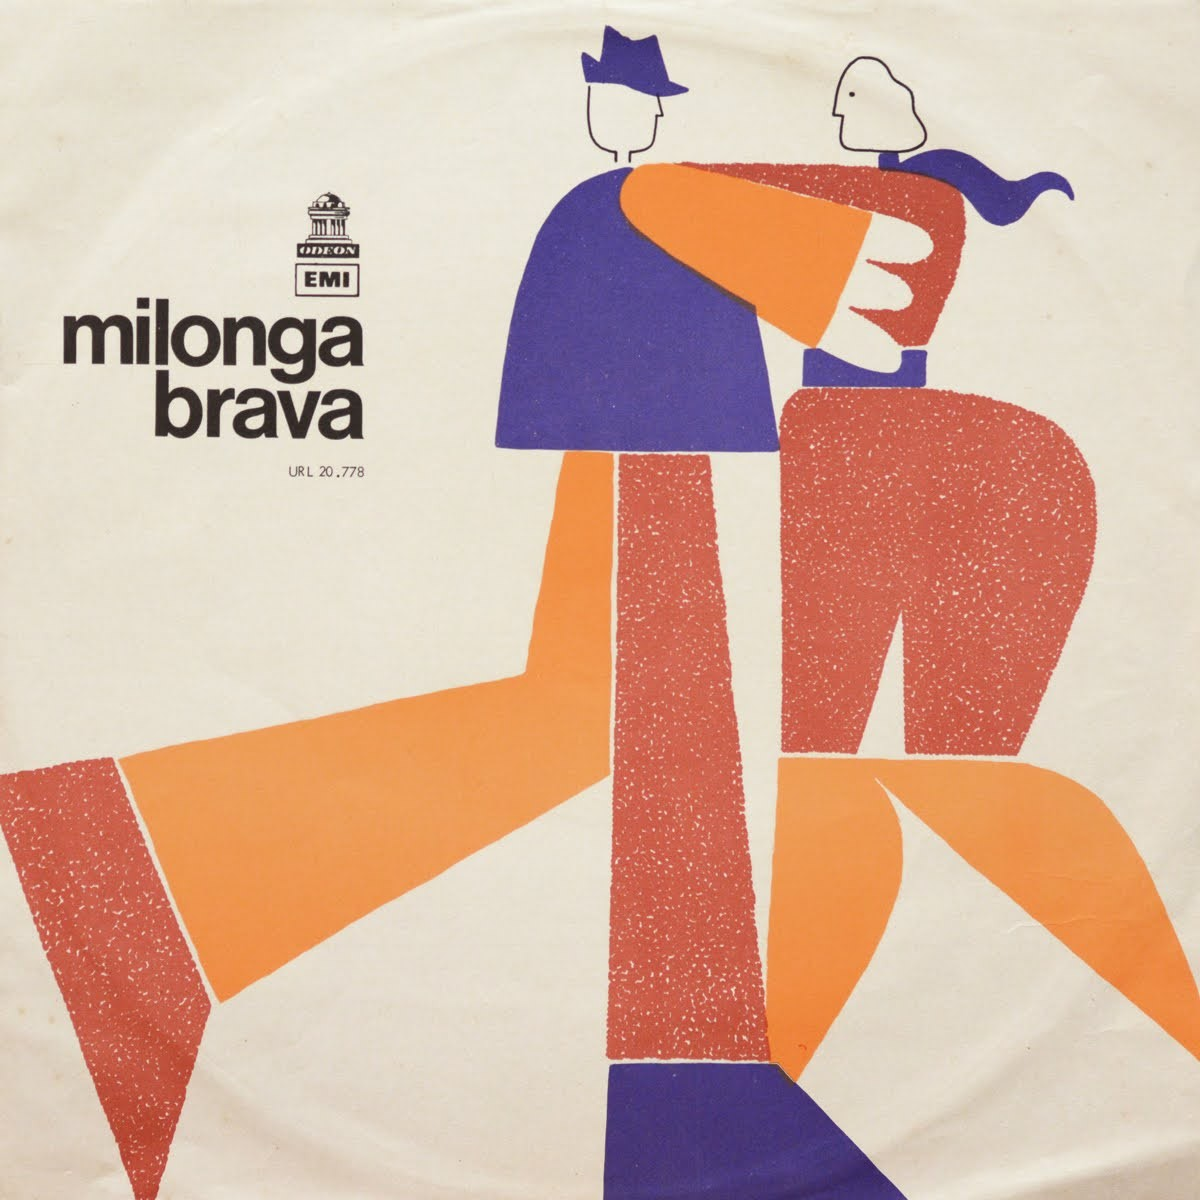 3.-record-cover-milonga-brava-fernando-alvarez-cozzi-1971.jpg